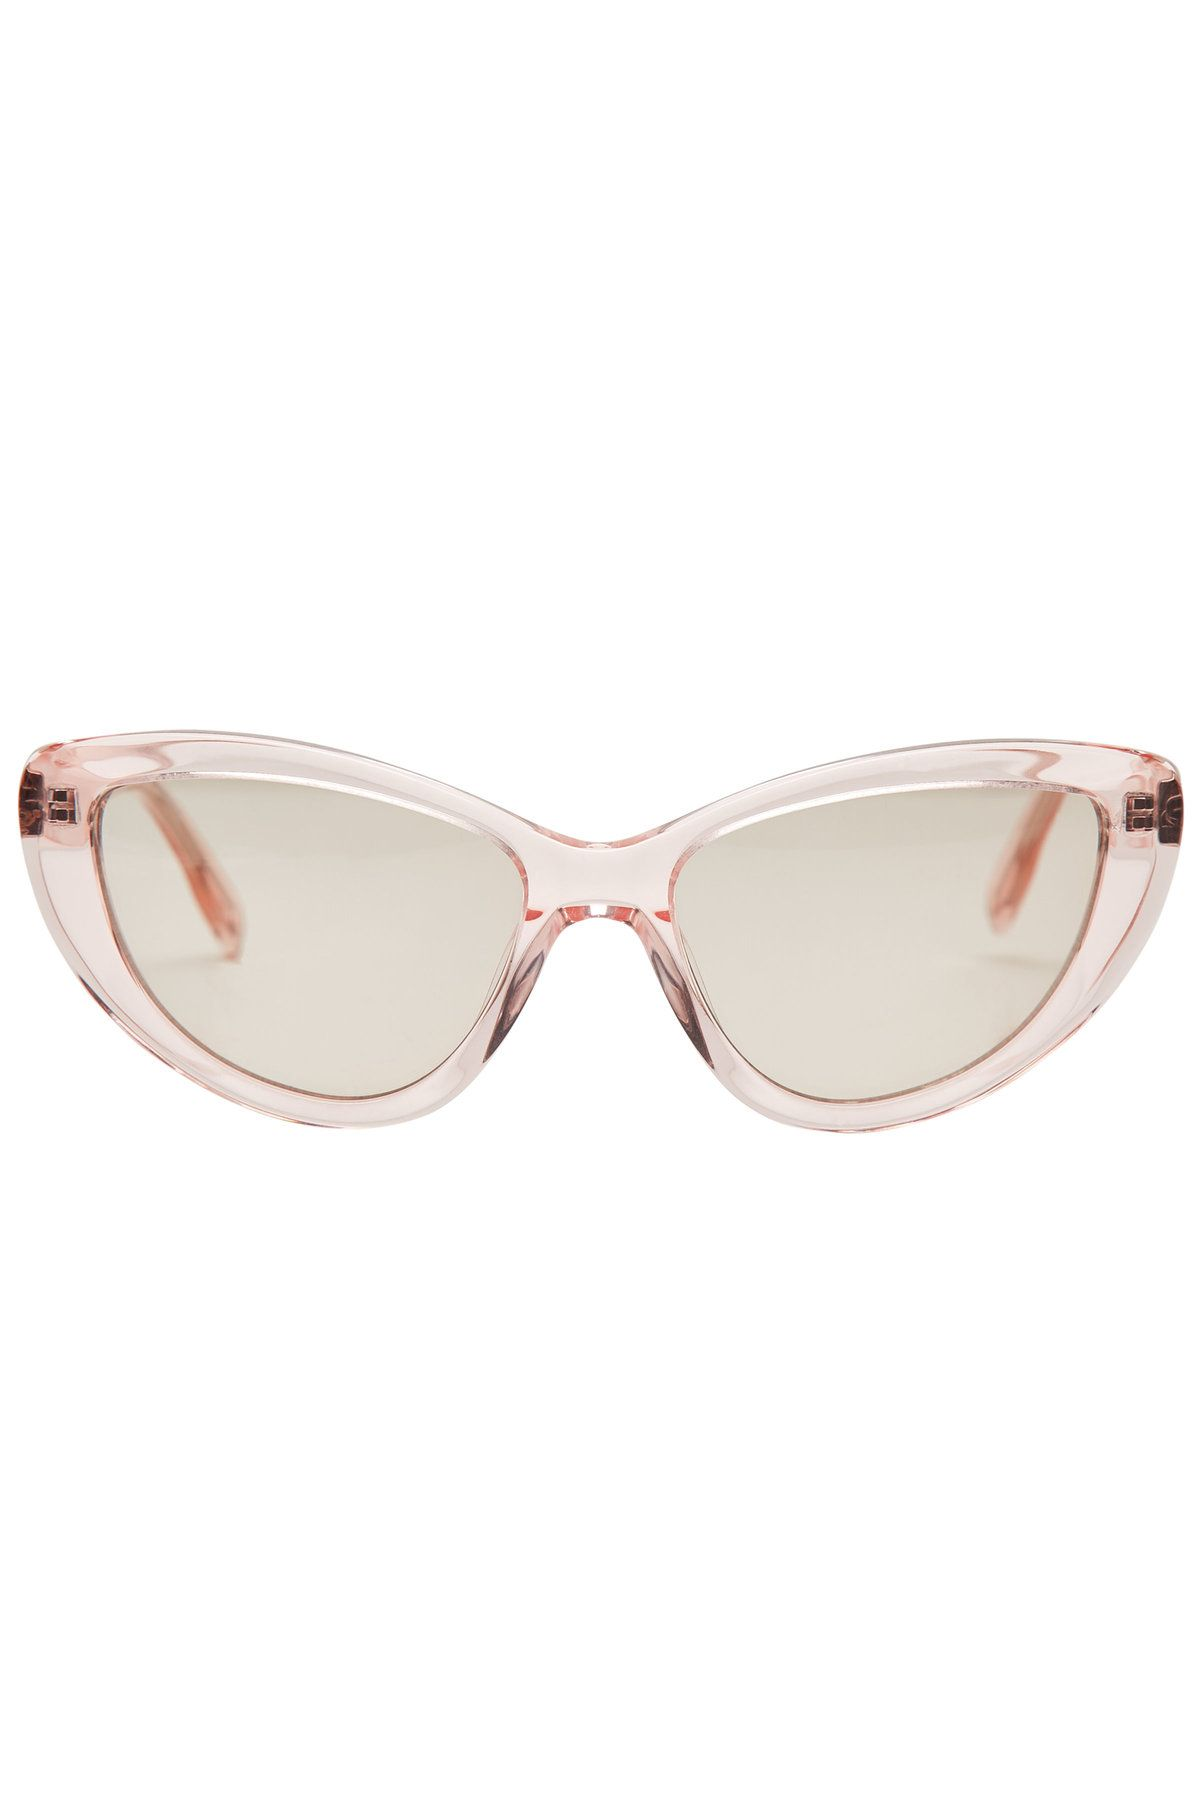 53a5d0342223 Ray-Ban RB2132 Unisex New Wayfarer Polarised Sunglasses